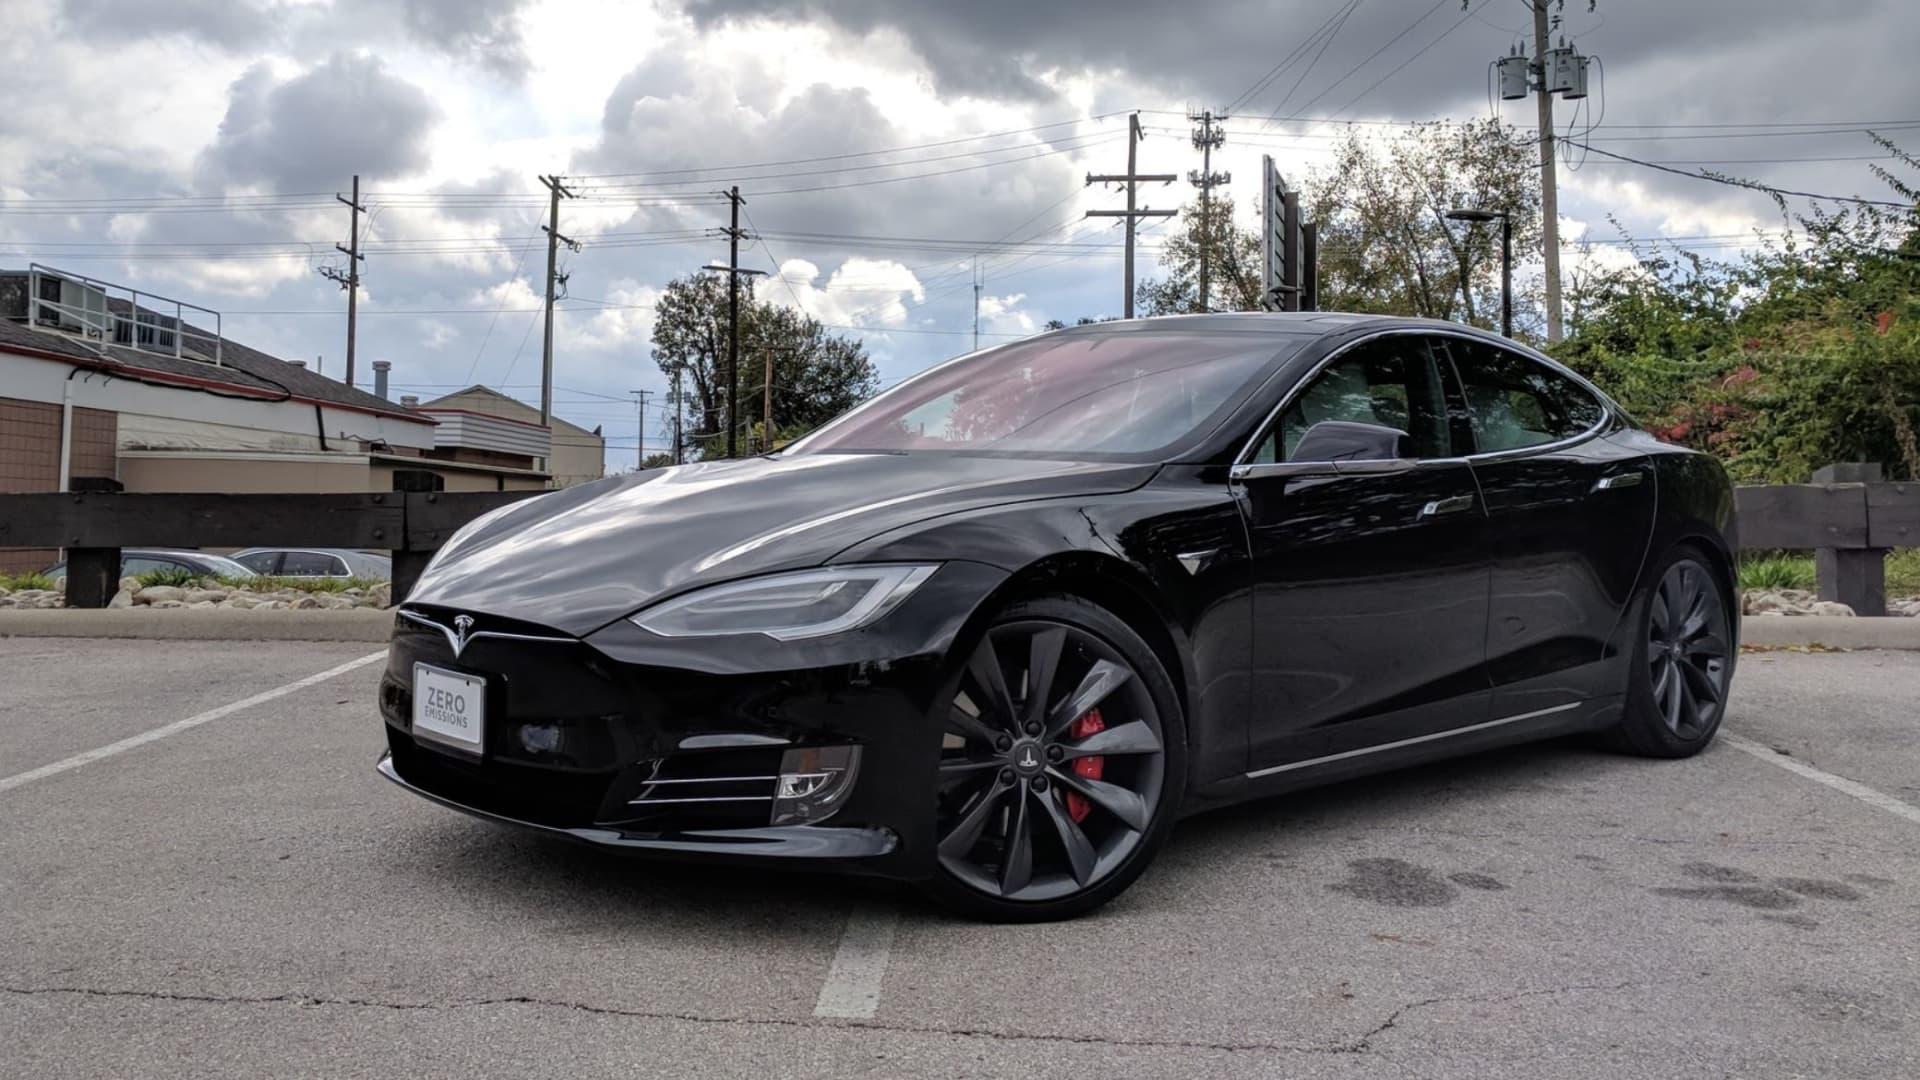 The Tesla Model S P100D